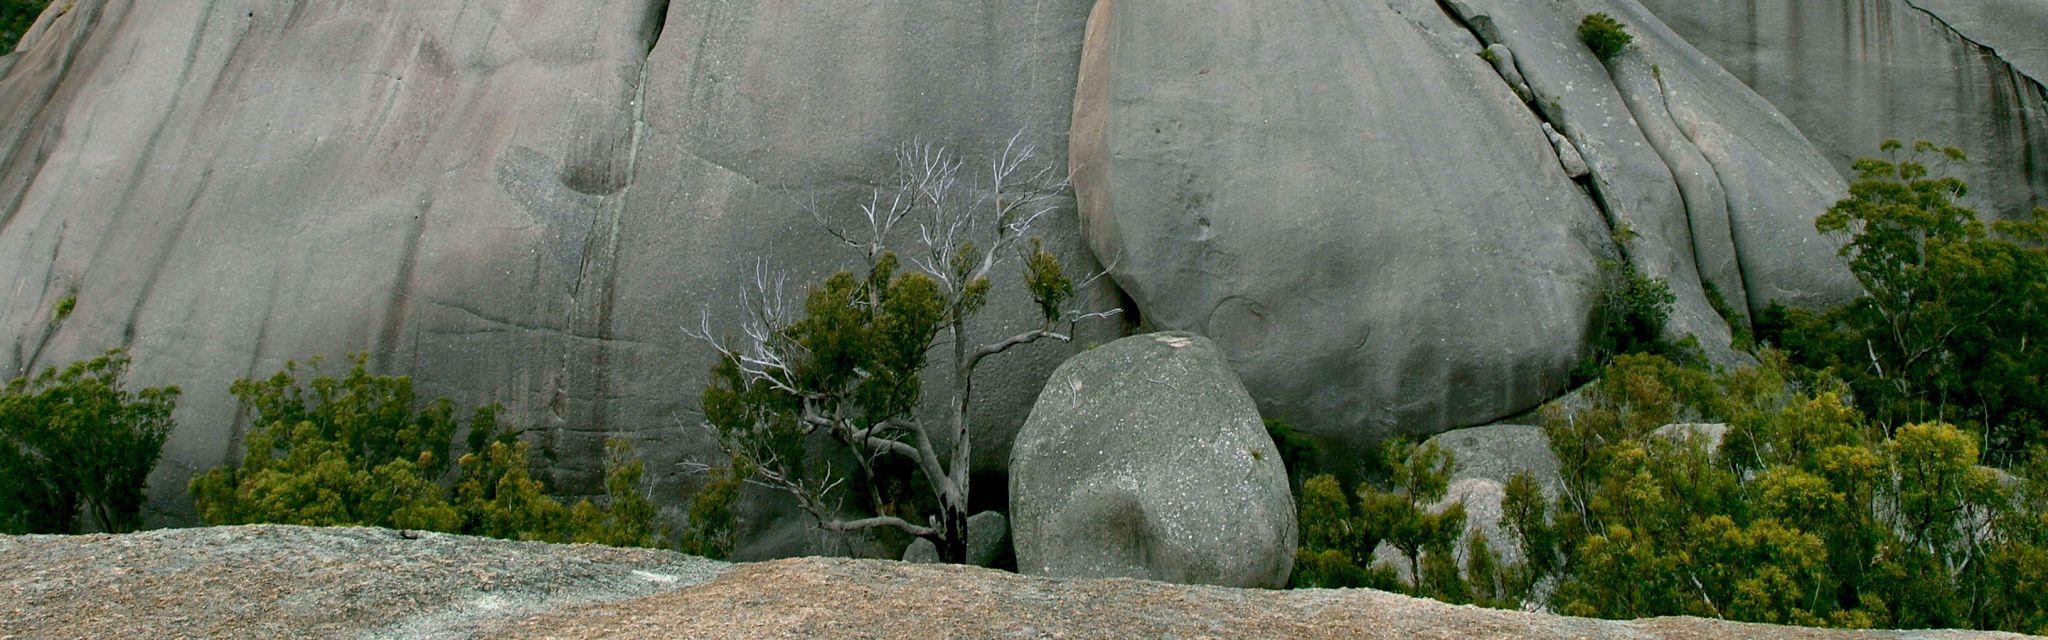 Crevis between the Girraween Pyramids, Australian world heritage Gondwana Tour